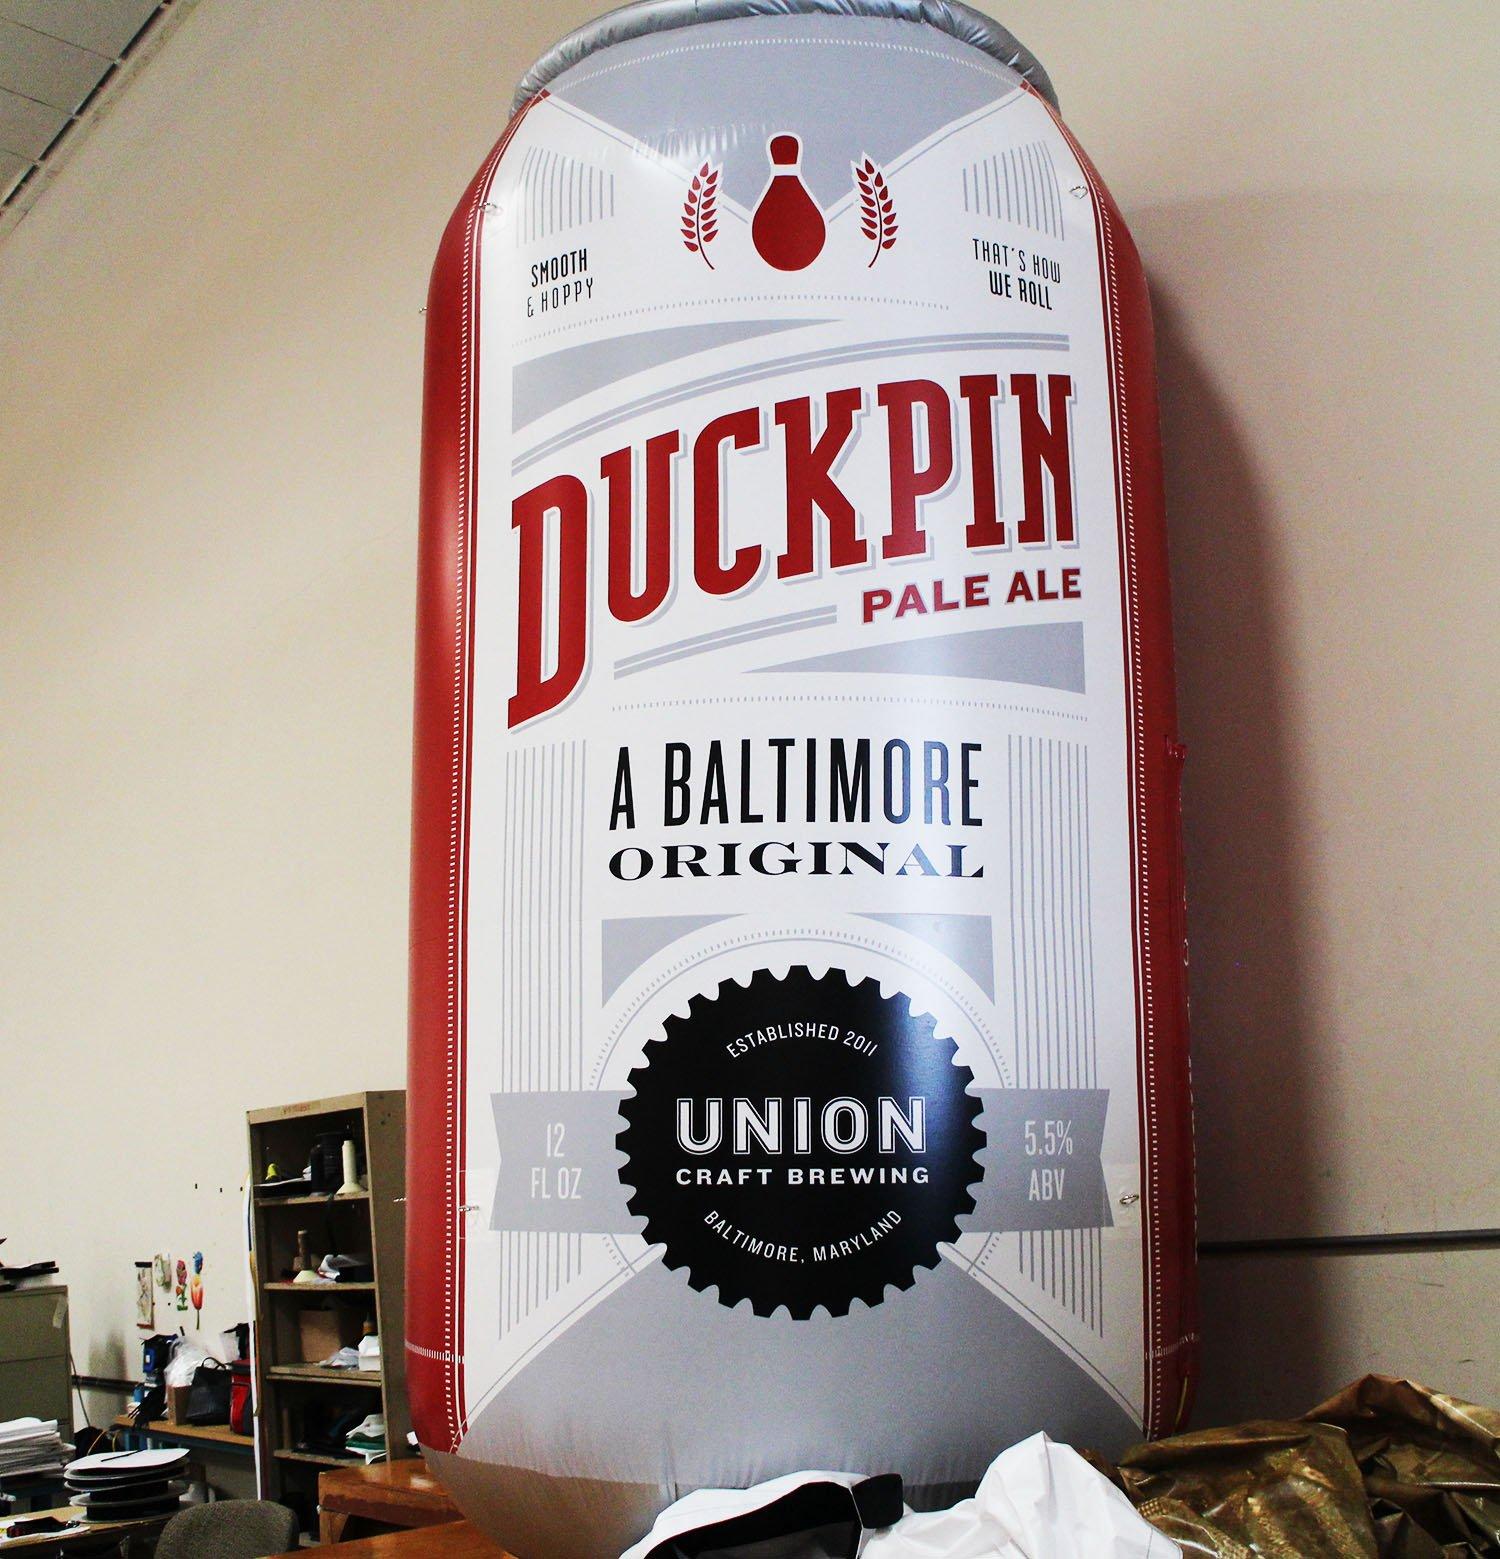 duckpin-beer-can-inflatable-replica